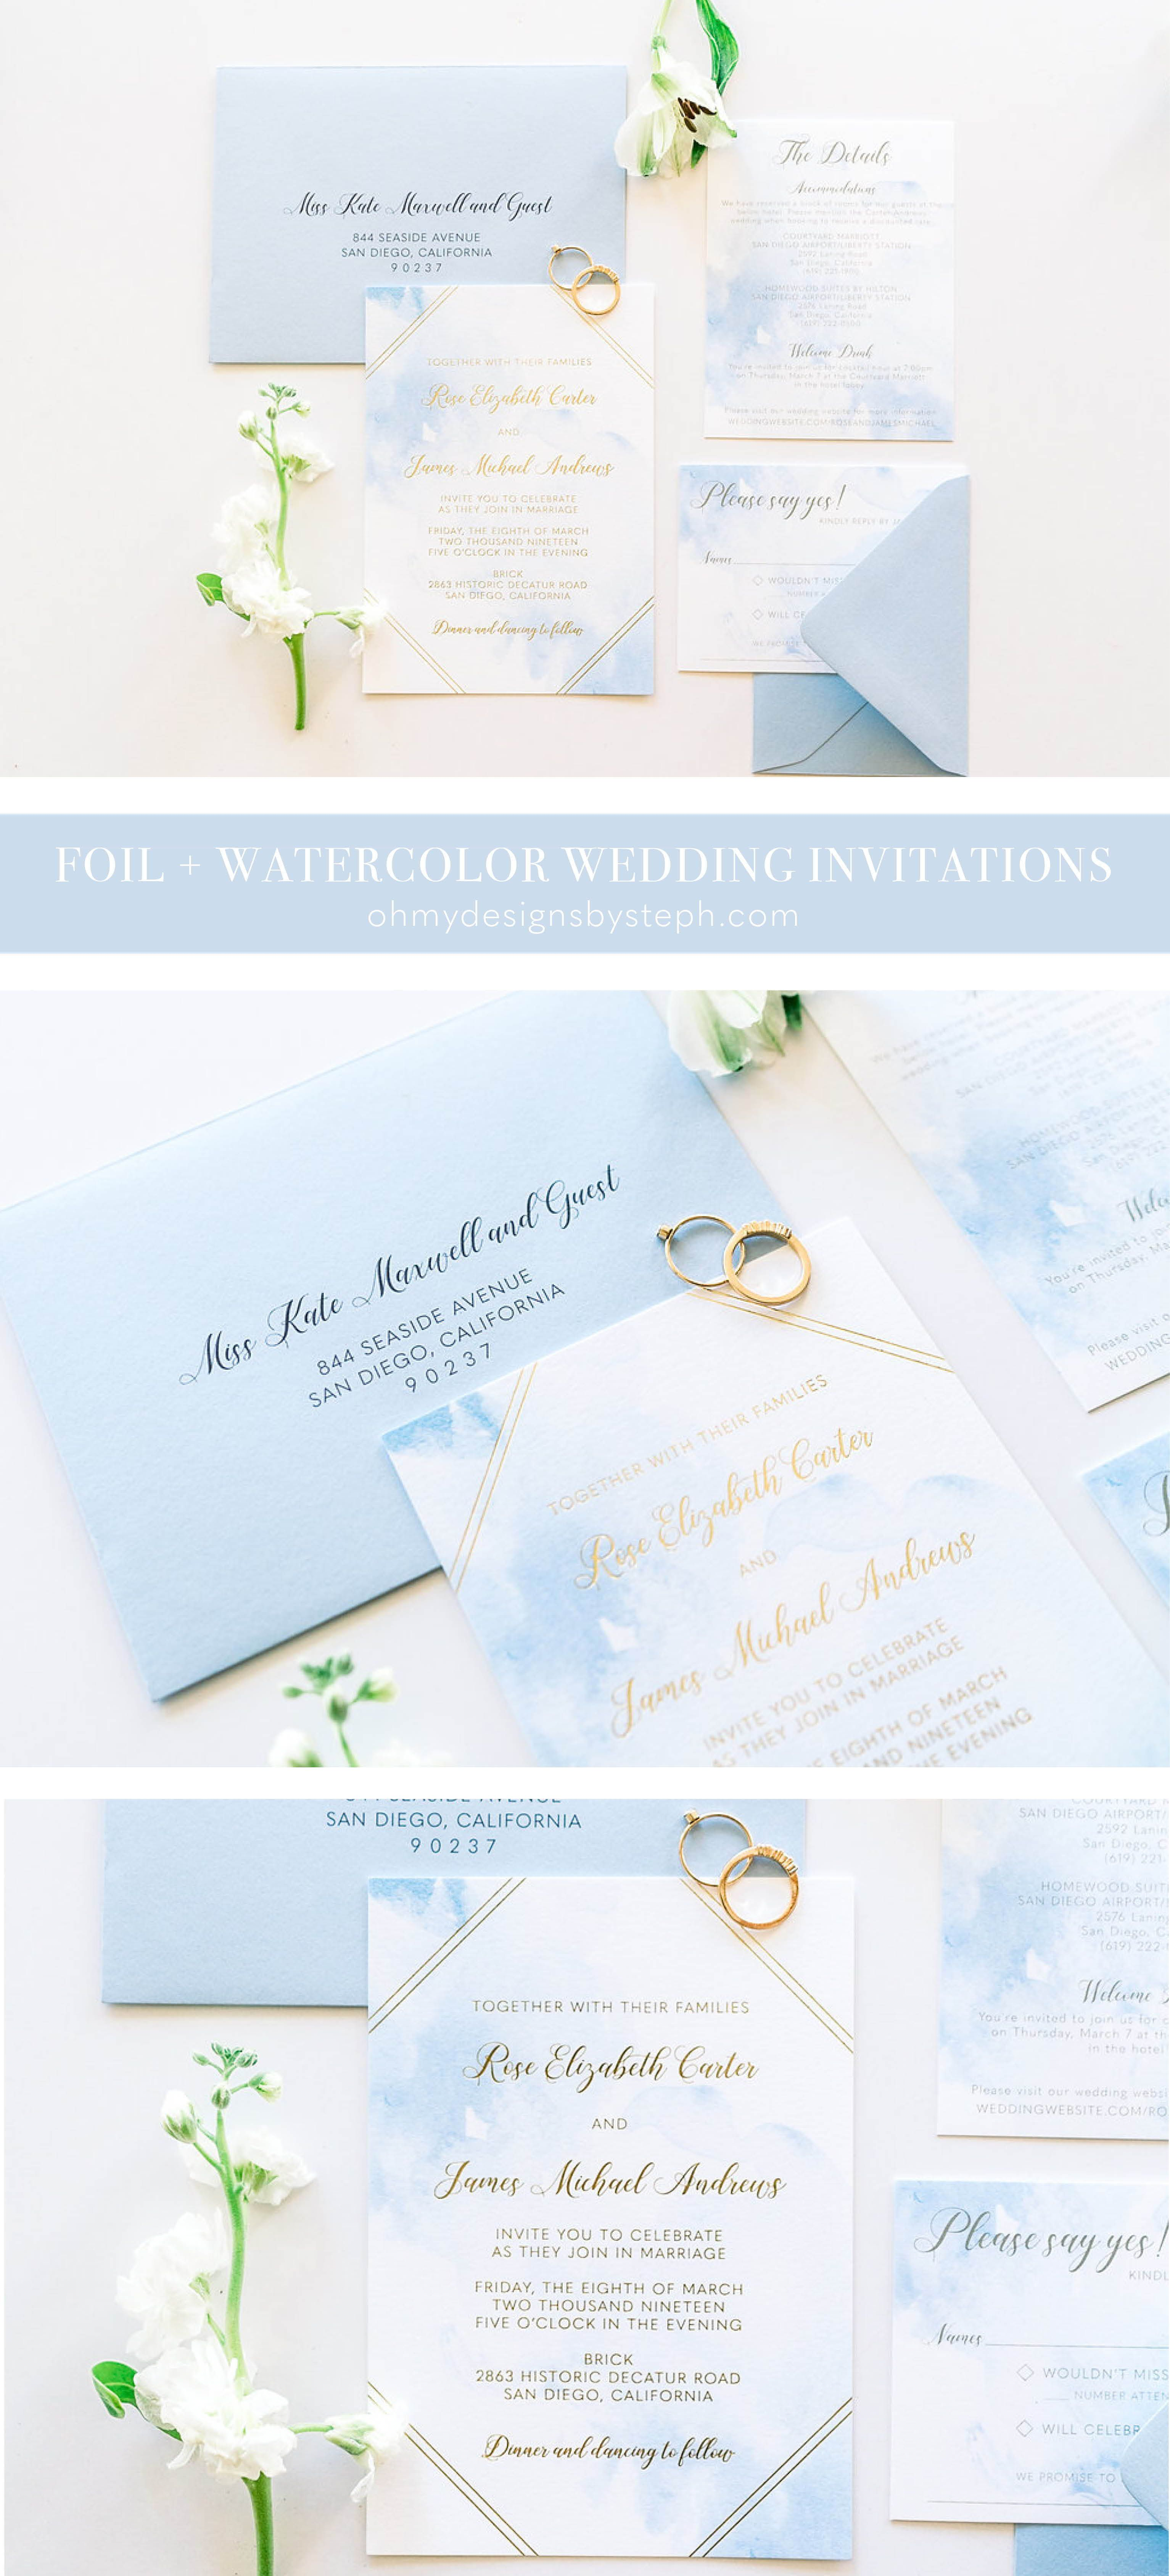 Gold Foil Watercolor Wedding Invitation Suite Sample Destination